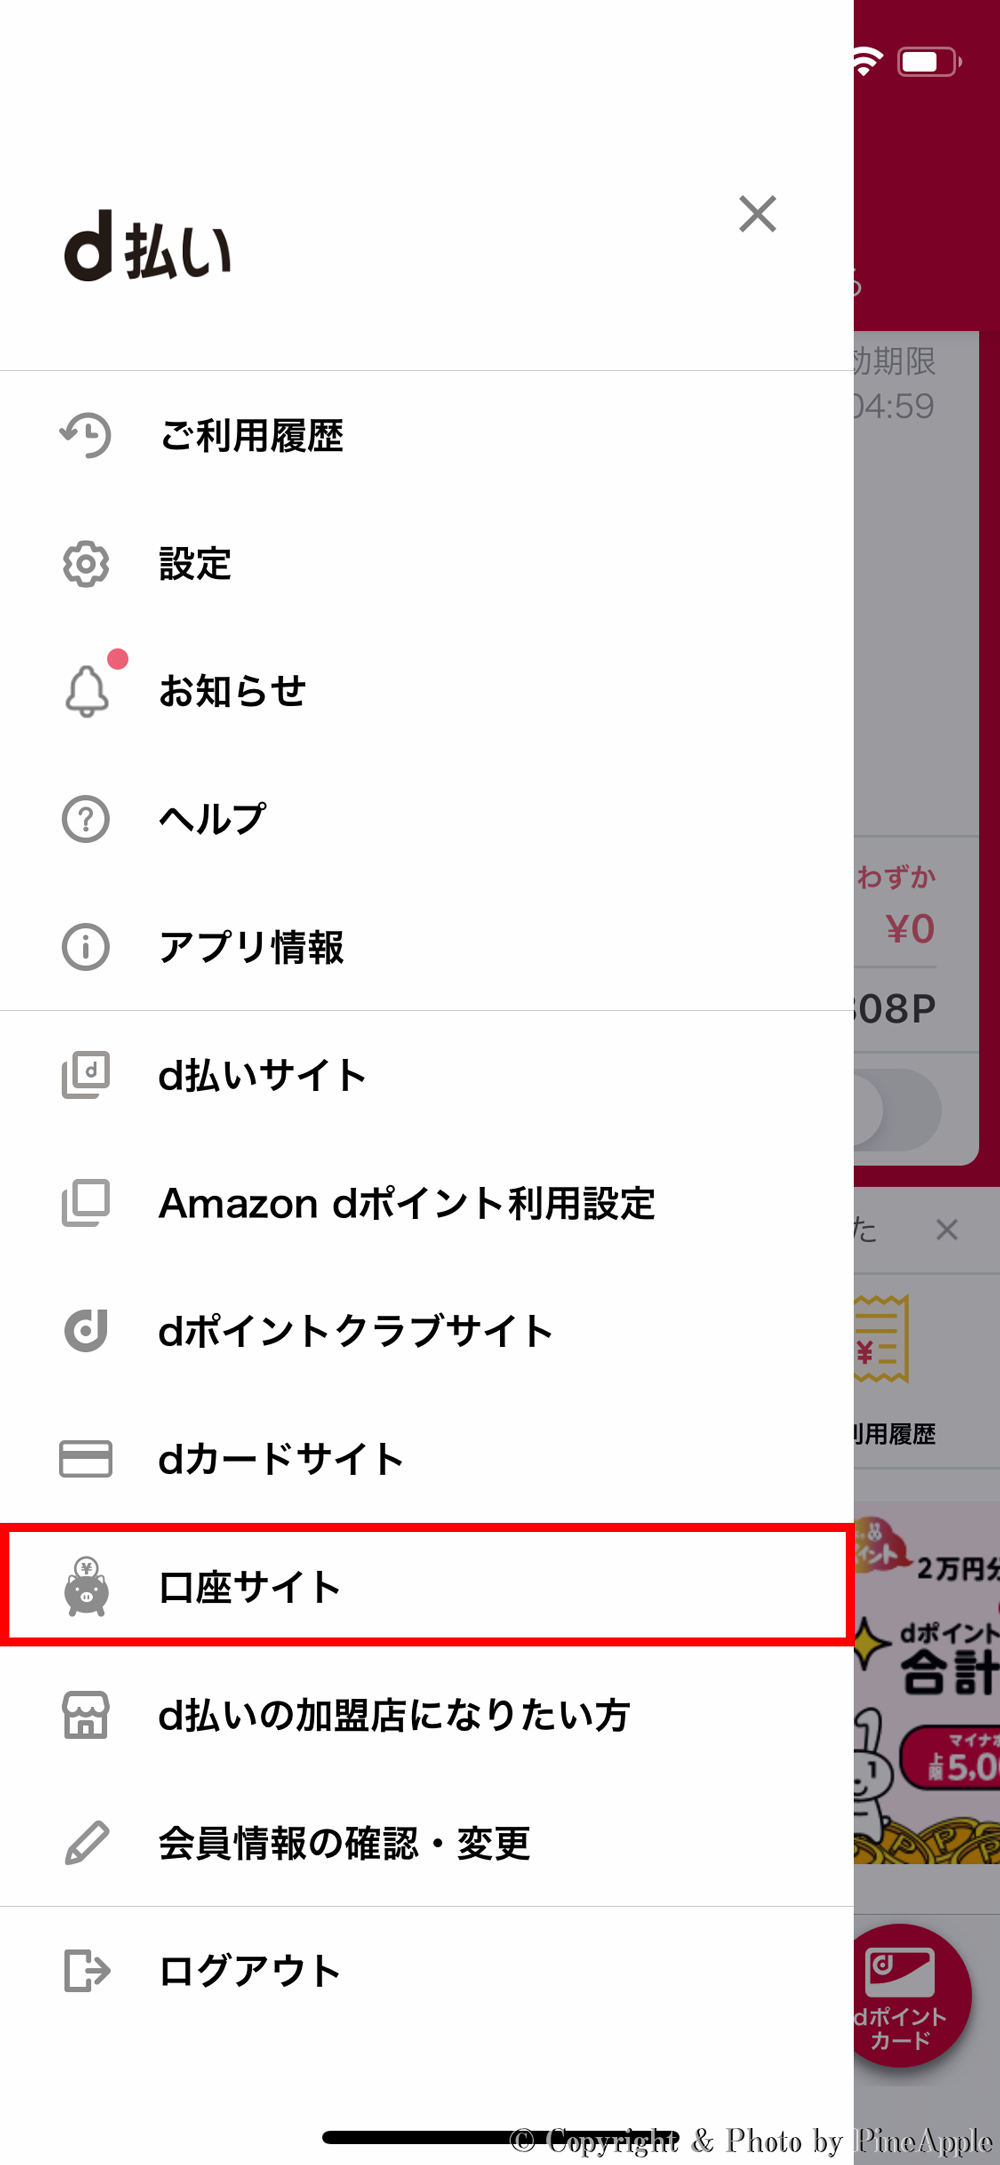 d 払い:「口座サイト」をタップ